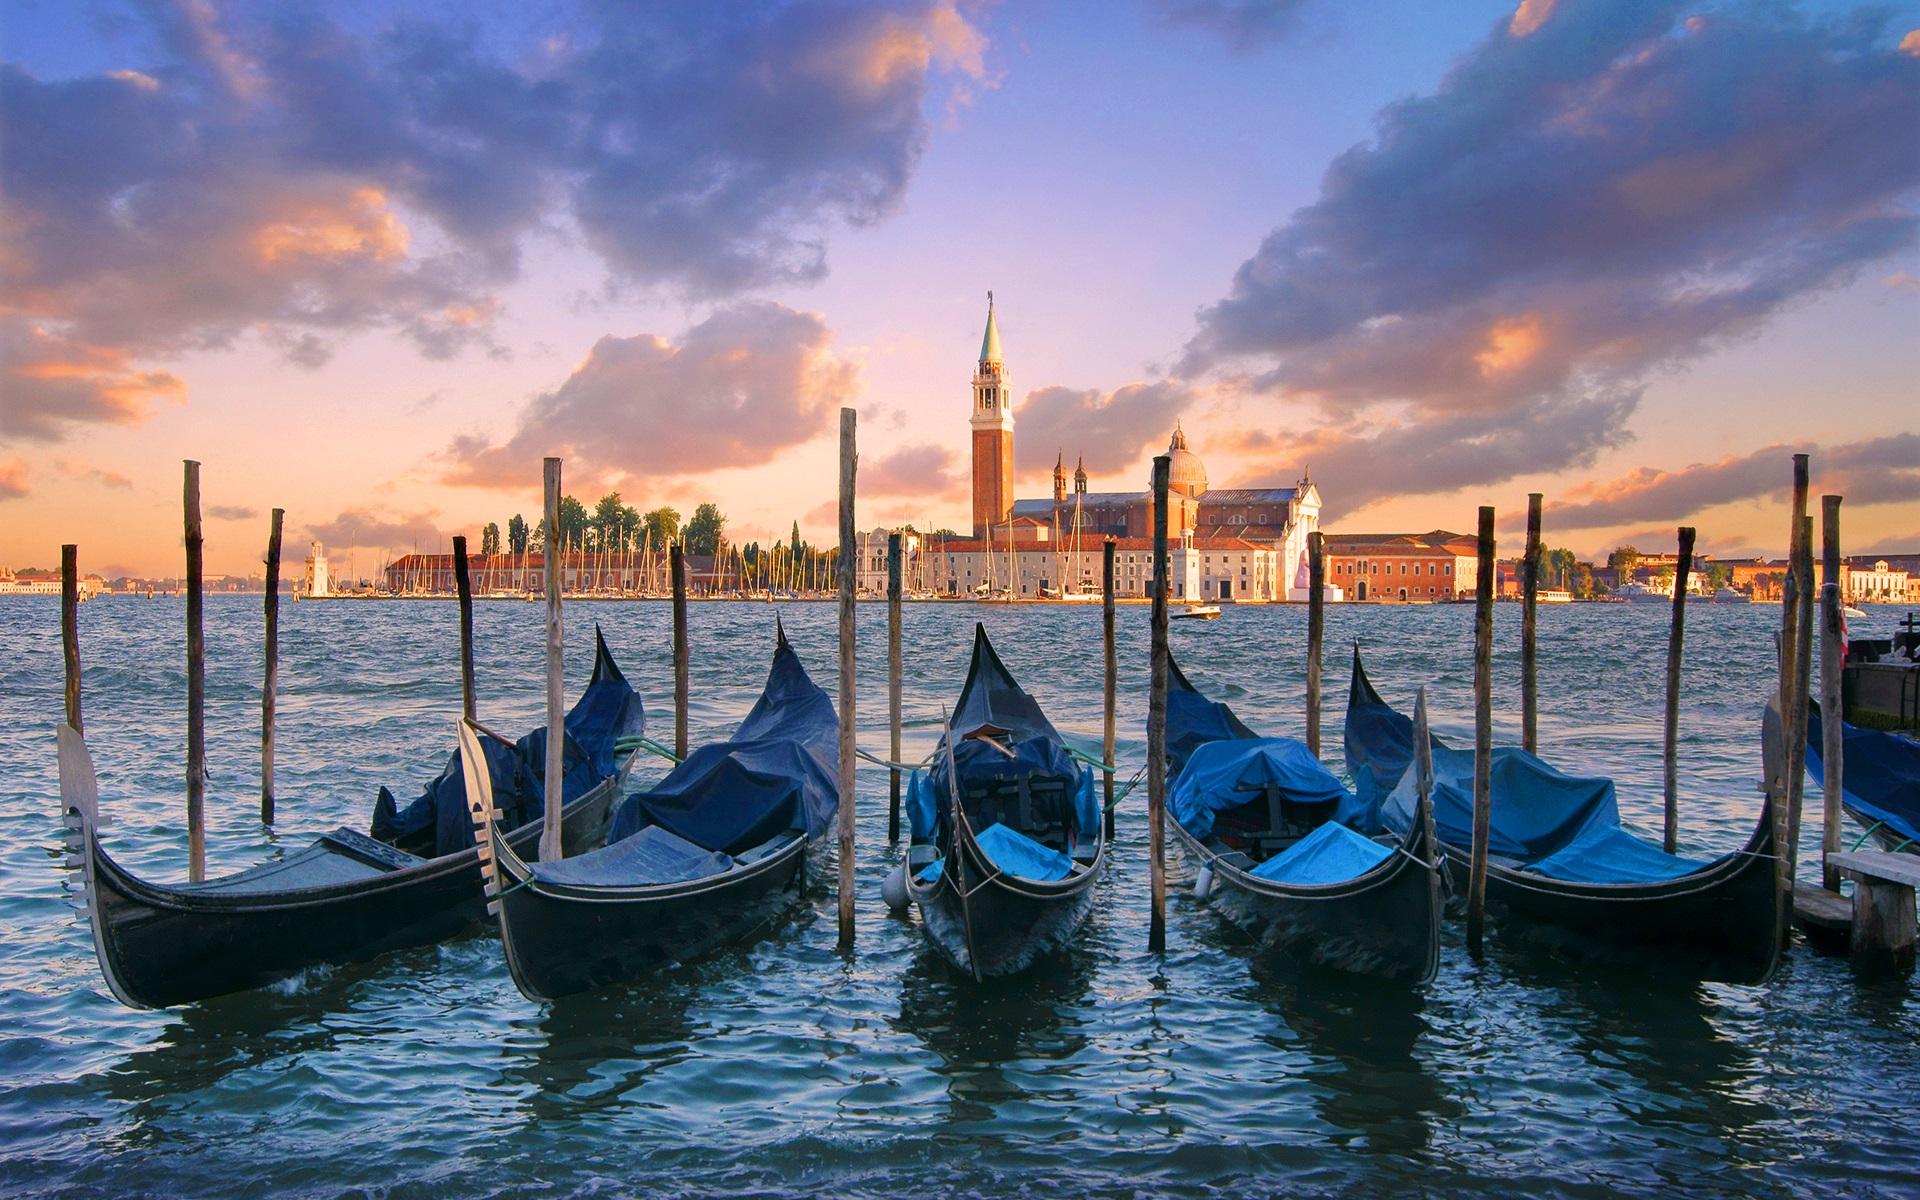 Ciudades europeas, Venecia